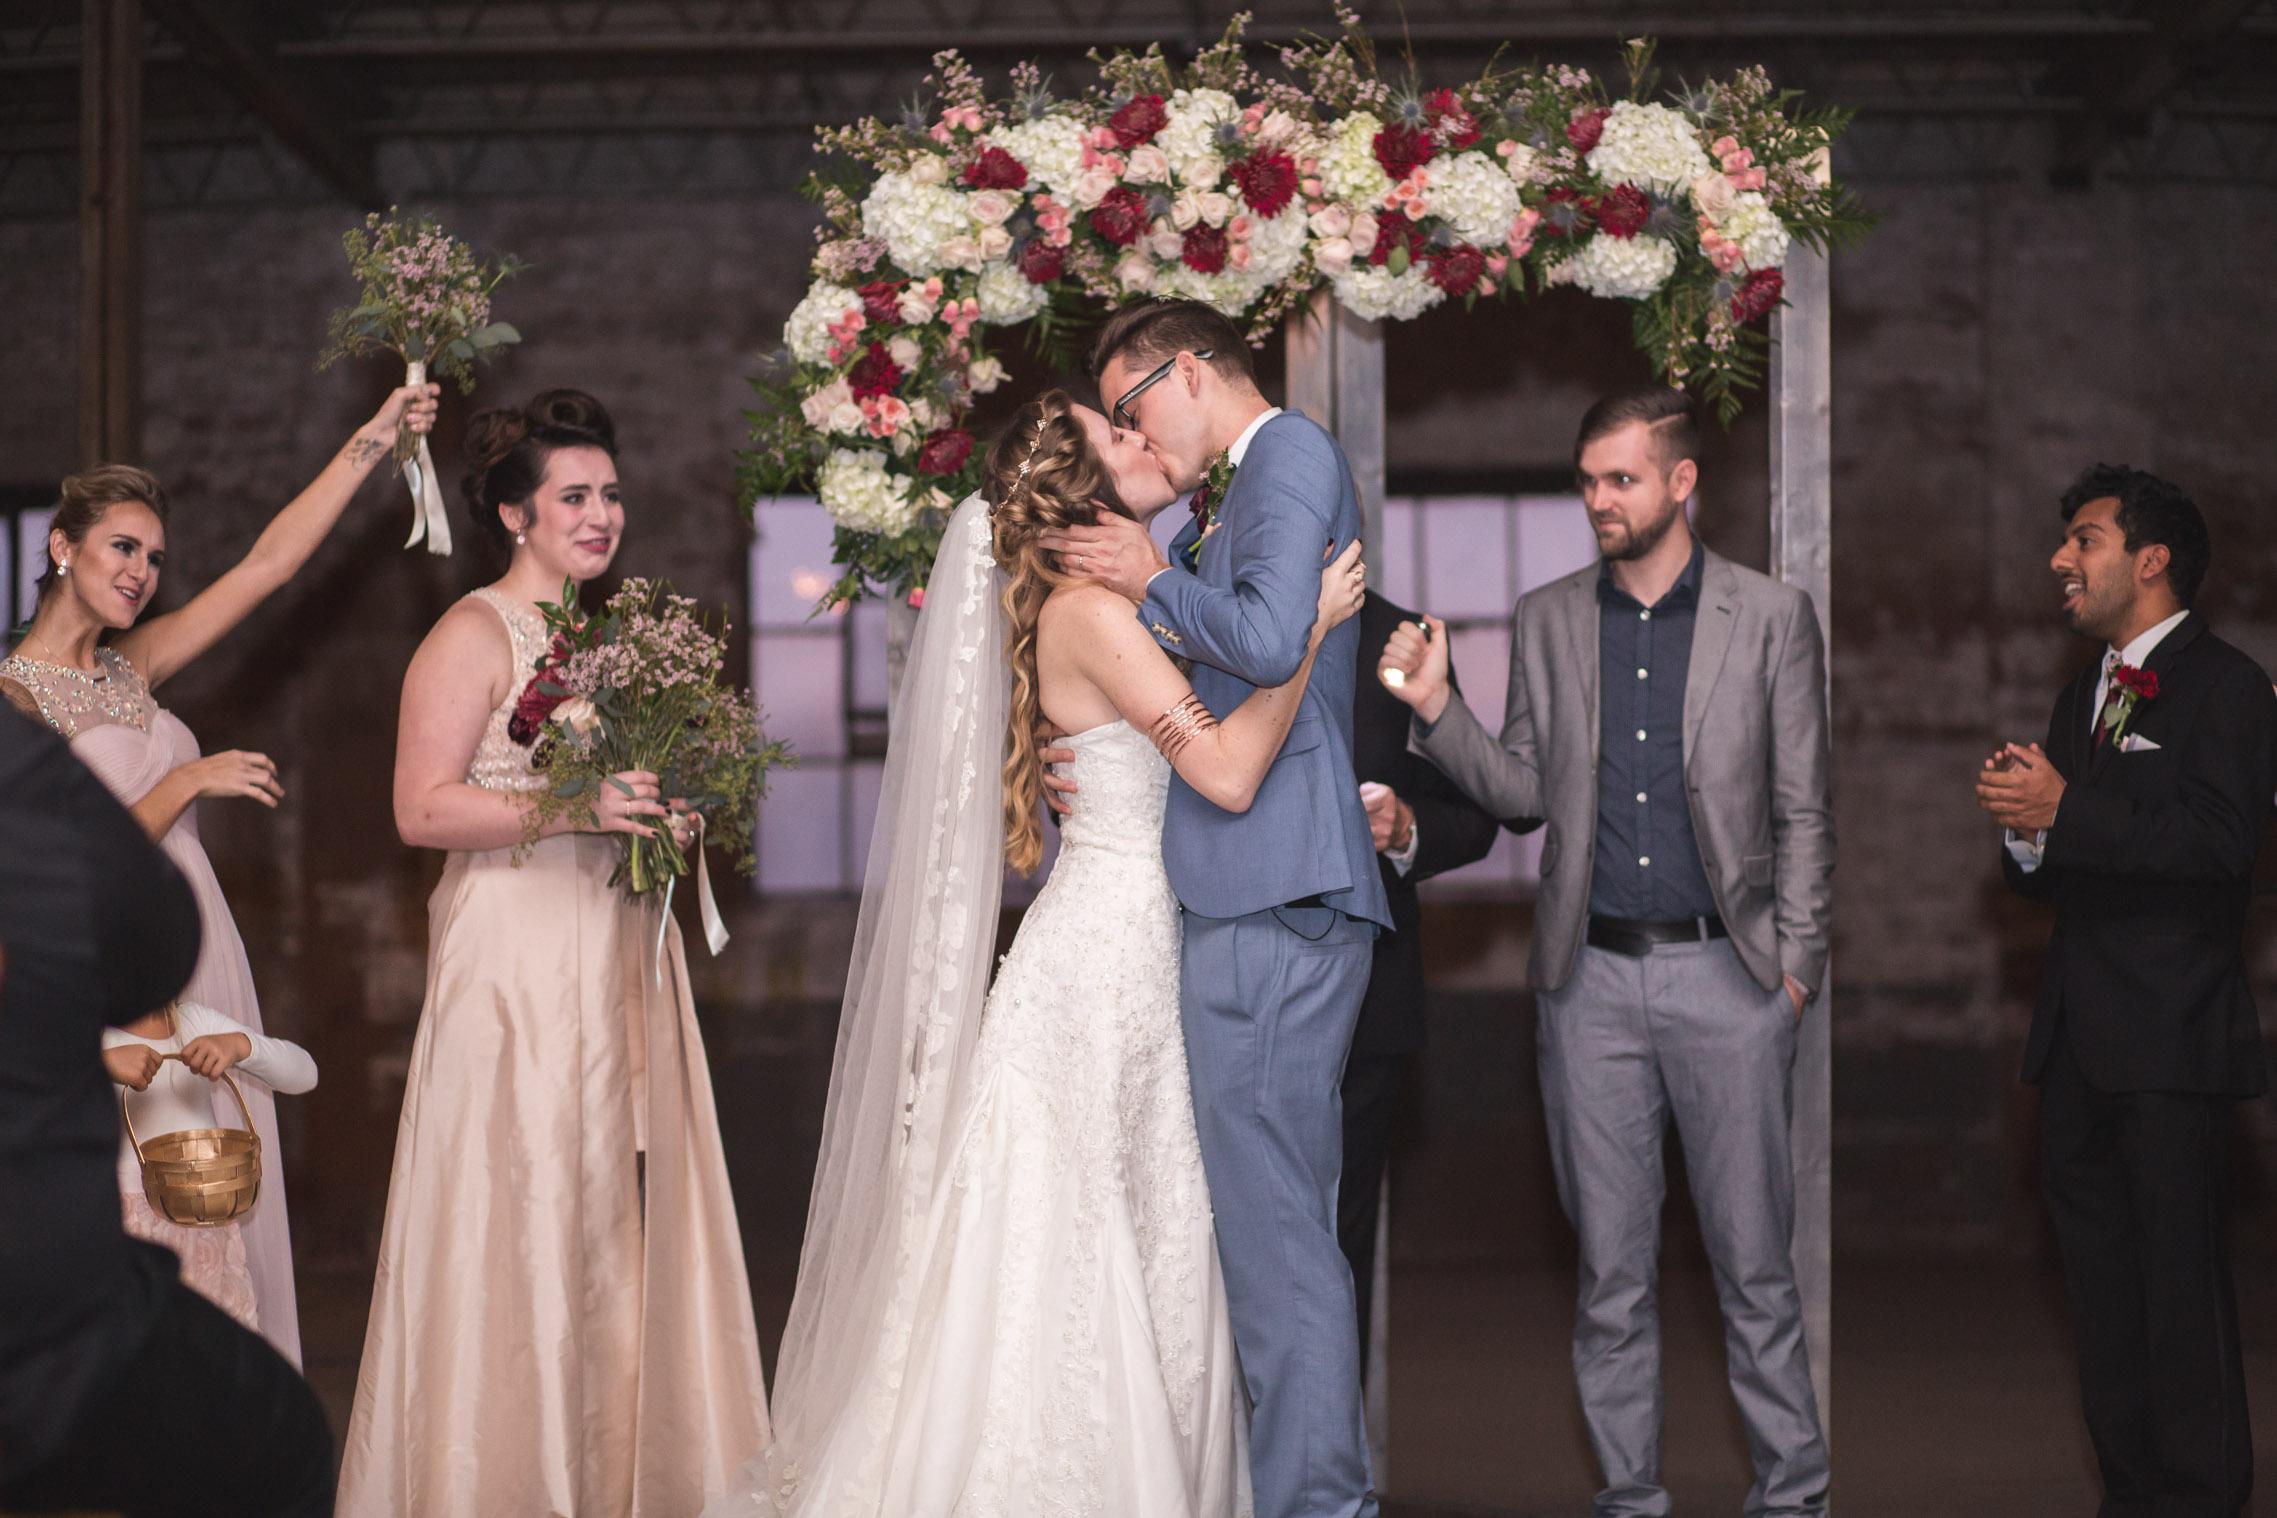 Adam-Szrmack-The-Glass-Factory-Wedding-114.jpg